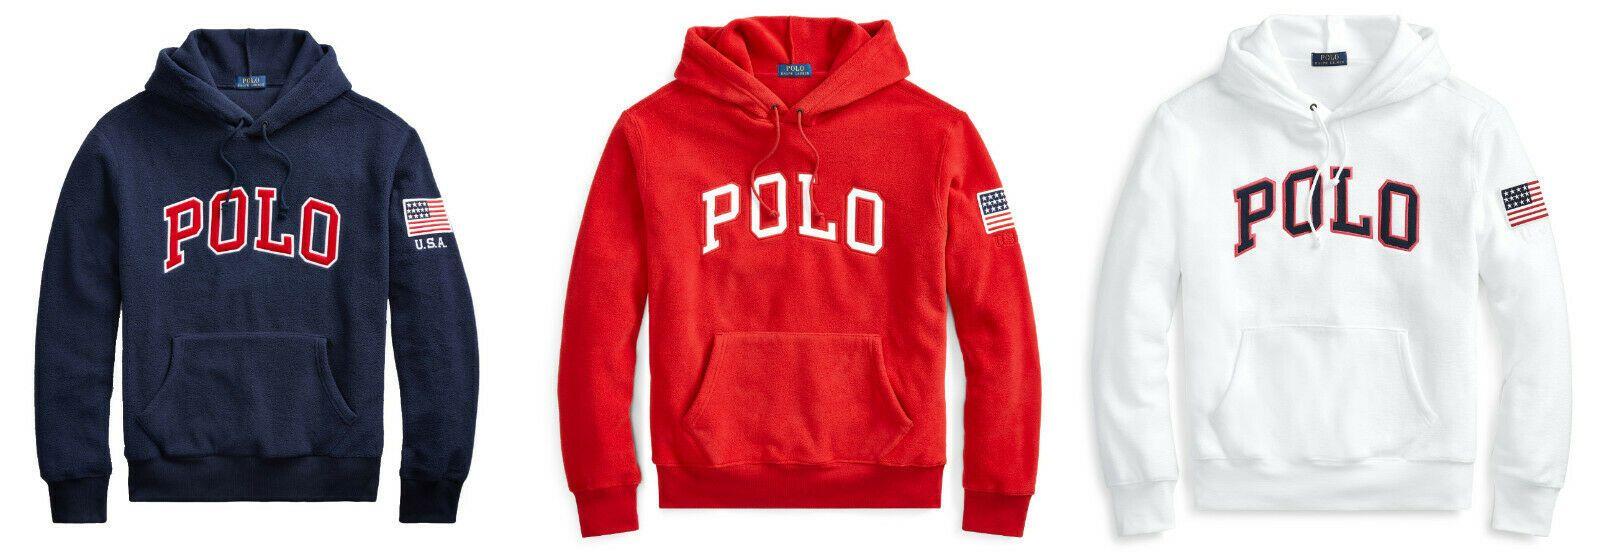 Polo Ralph Lauren American Usa Flag Fleece Sweatshirt Hoodie New 148 Https Uxshops Com P 55828 Sweatshirts Hoodie Sweatshirts Sweatshirt Fleece [ 552 x 1599 Pixel ]